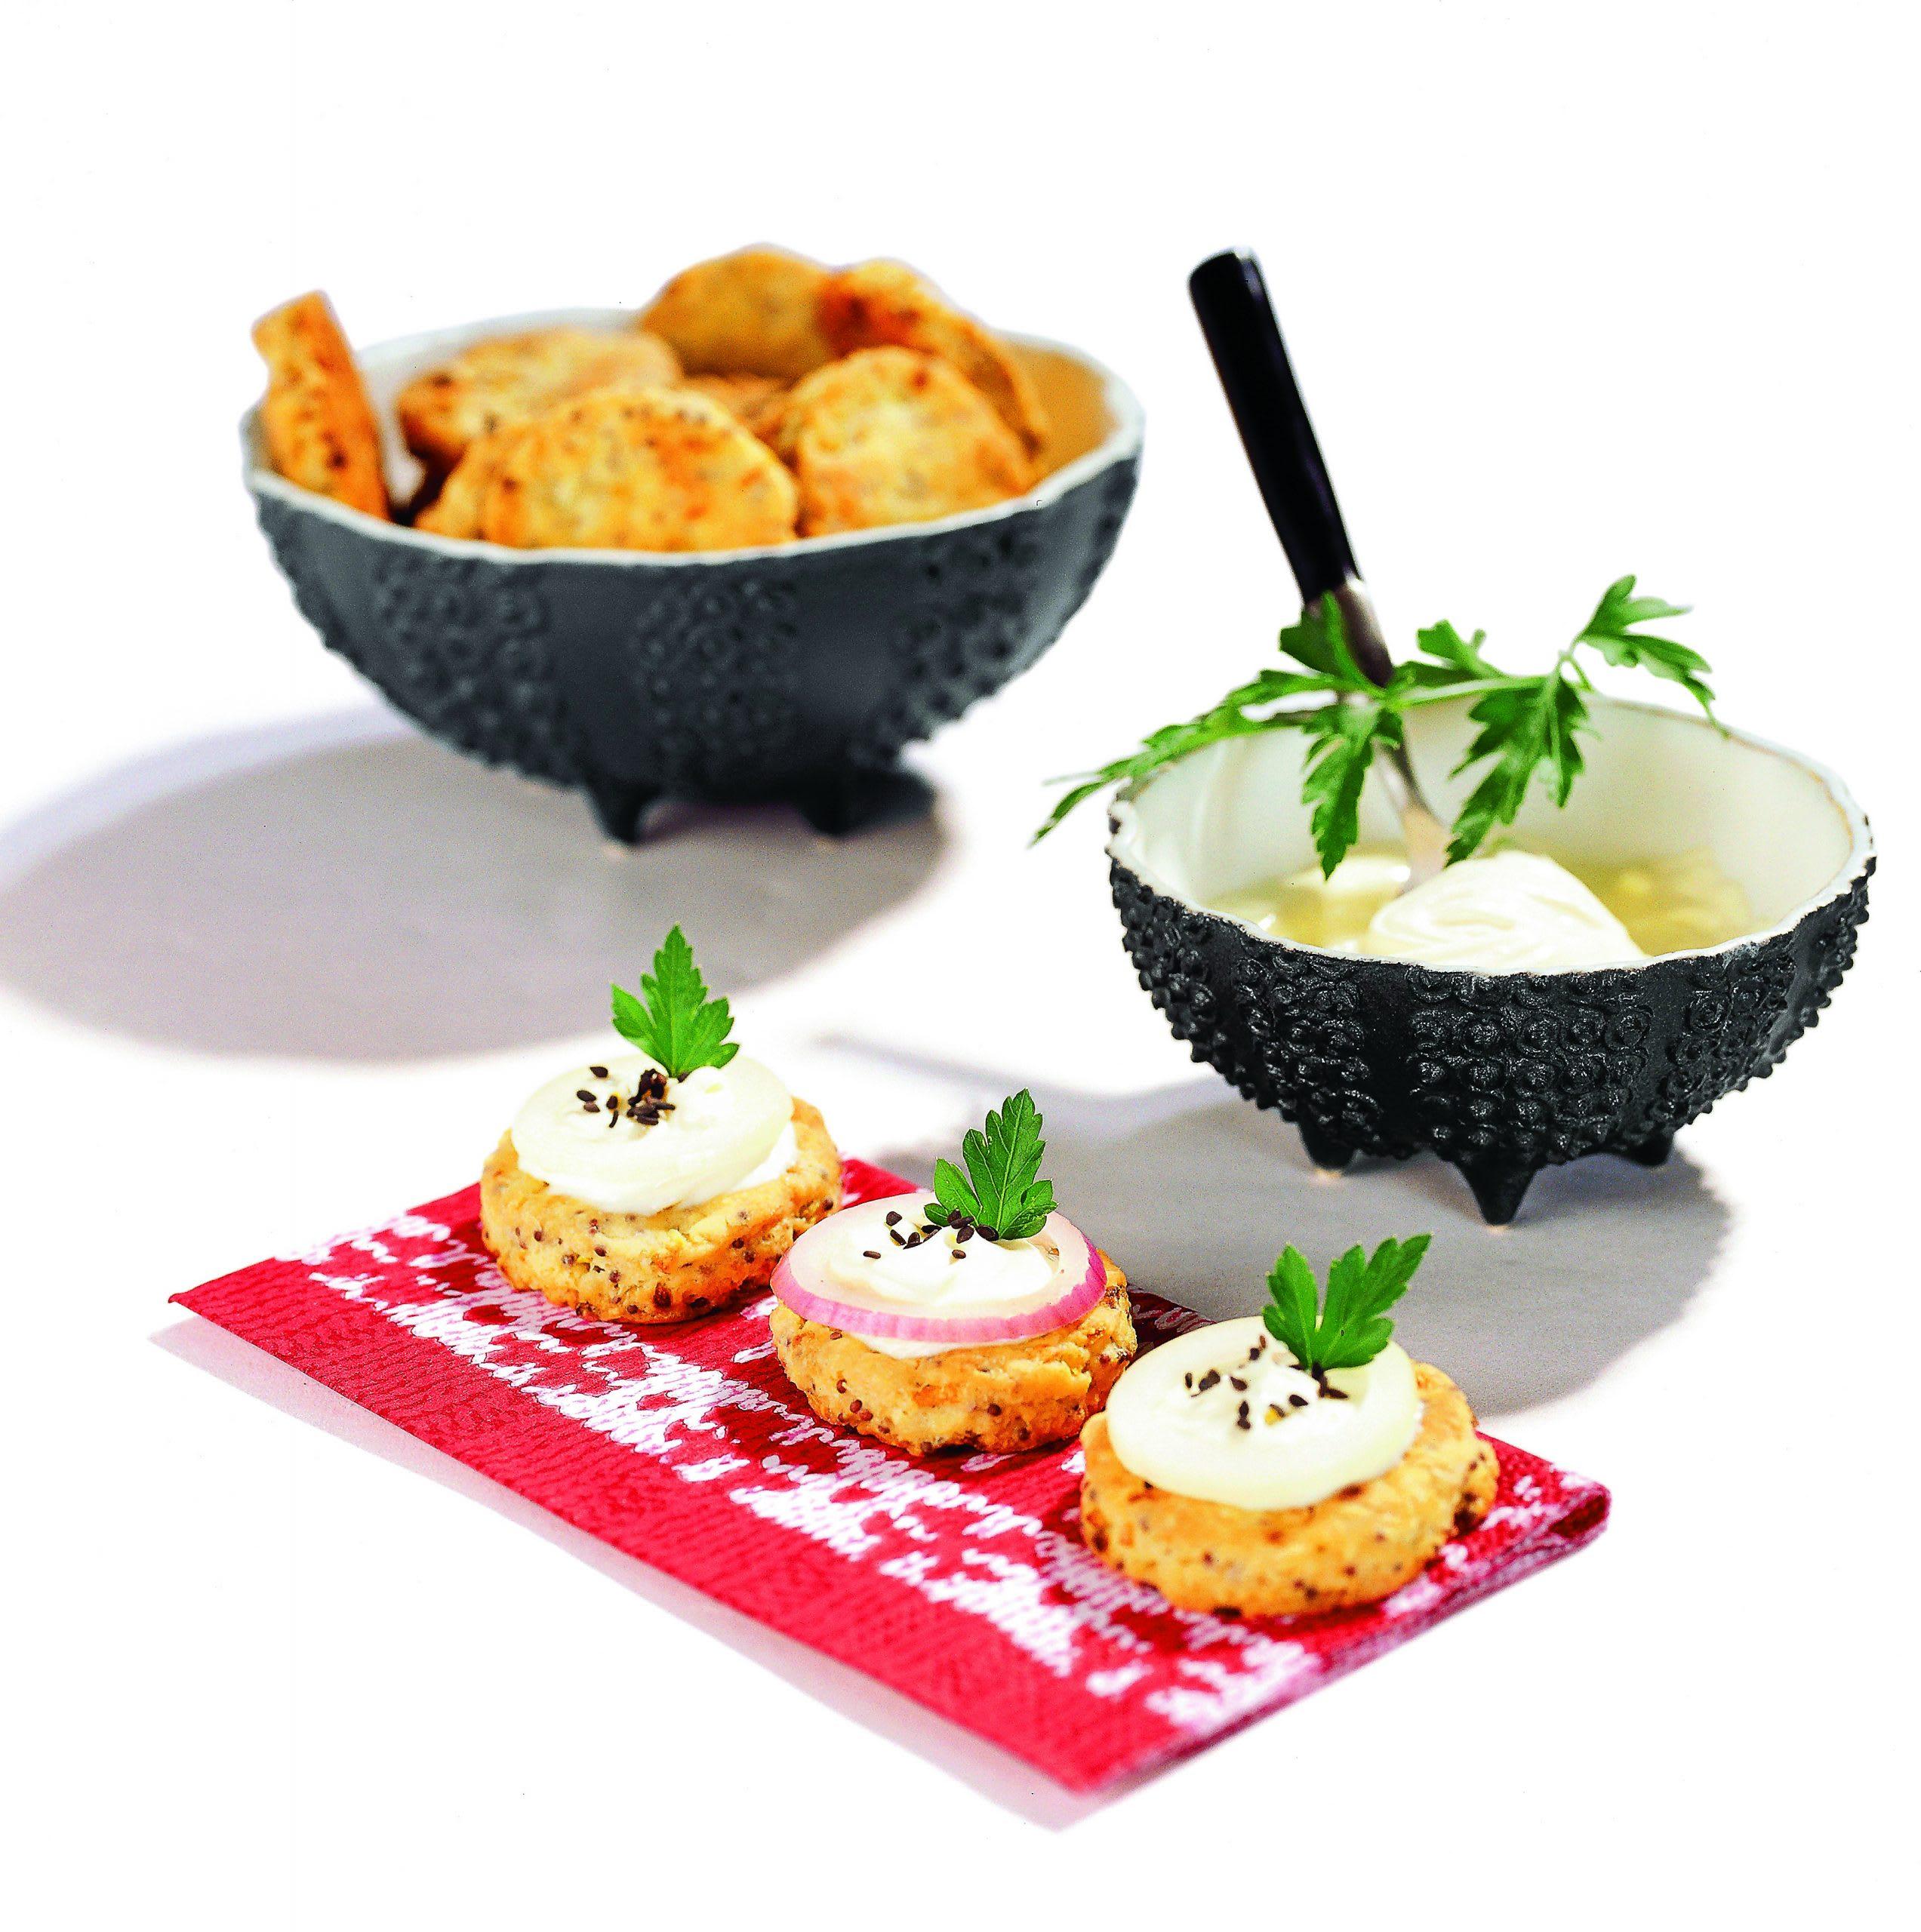 Cookies aux oignons